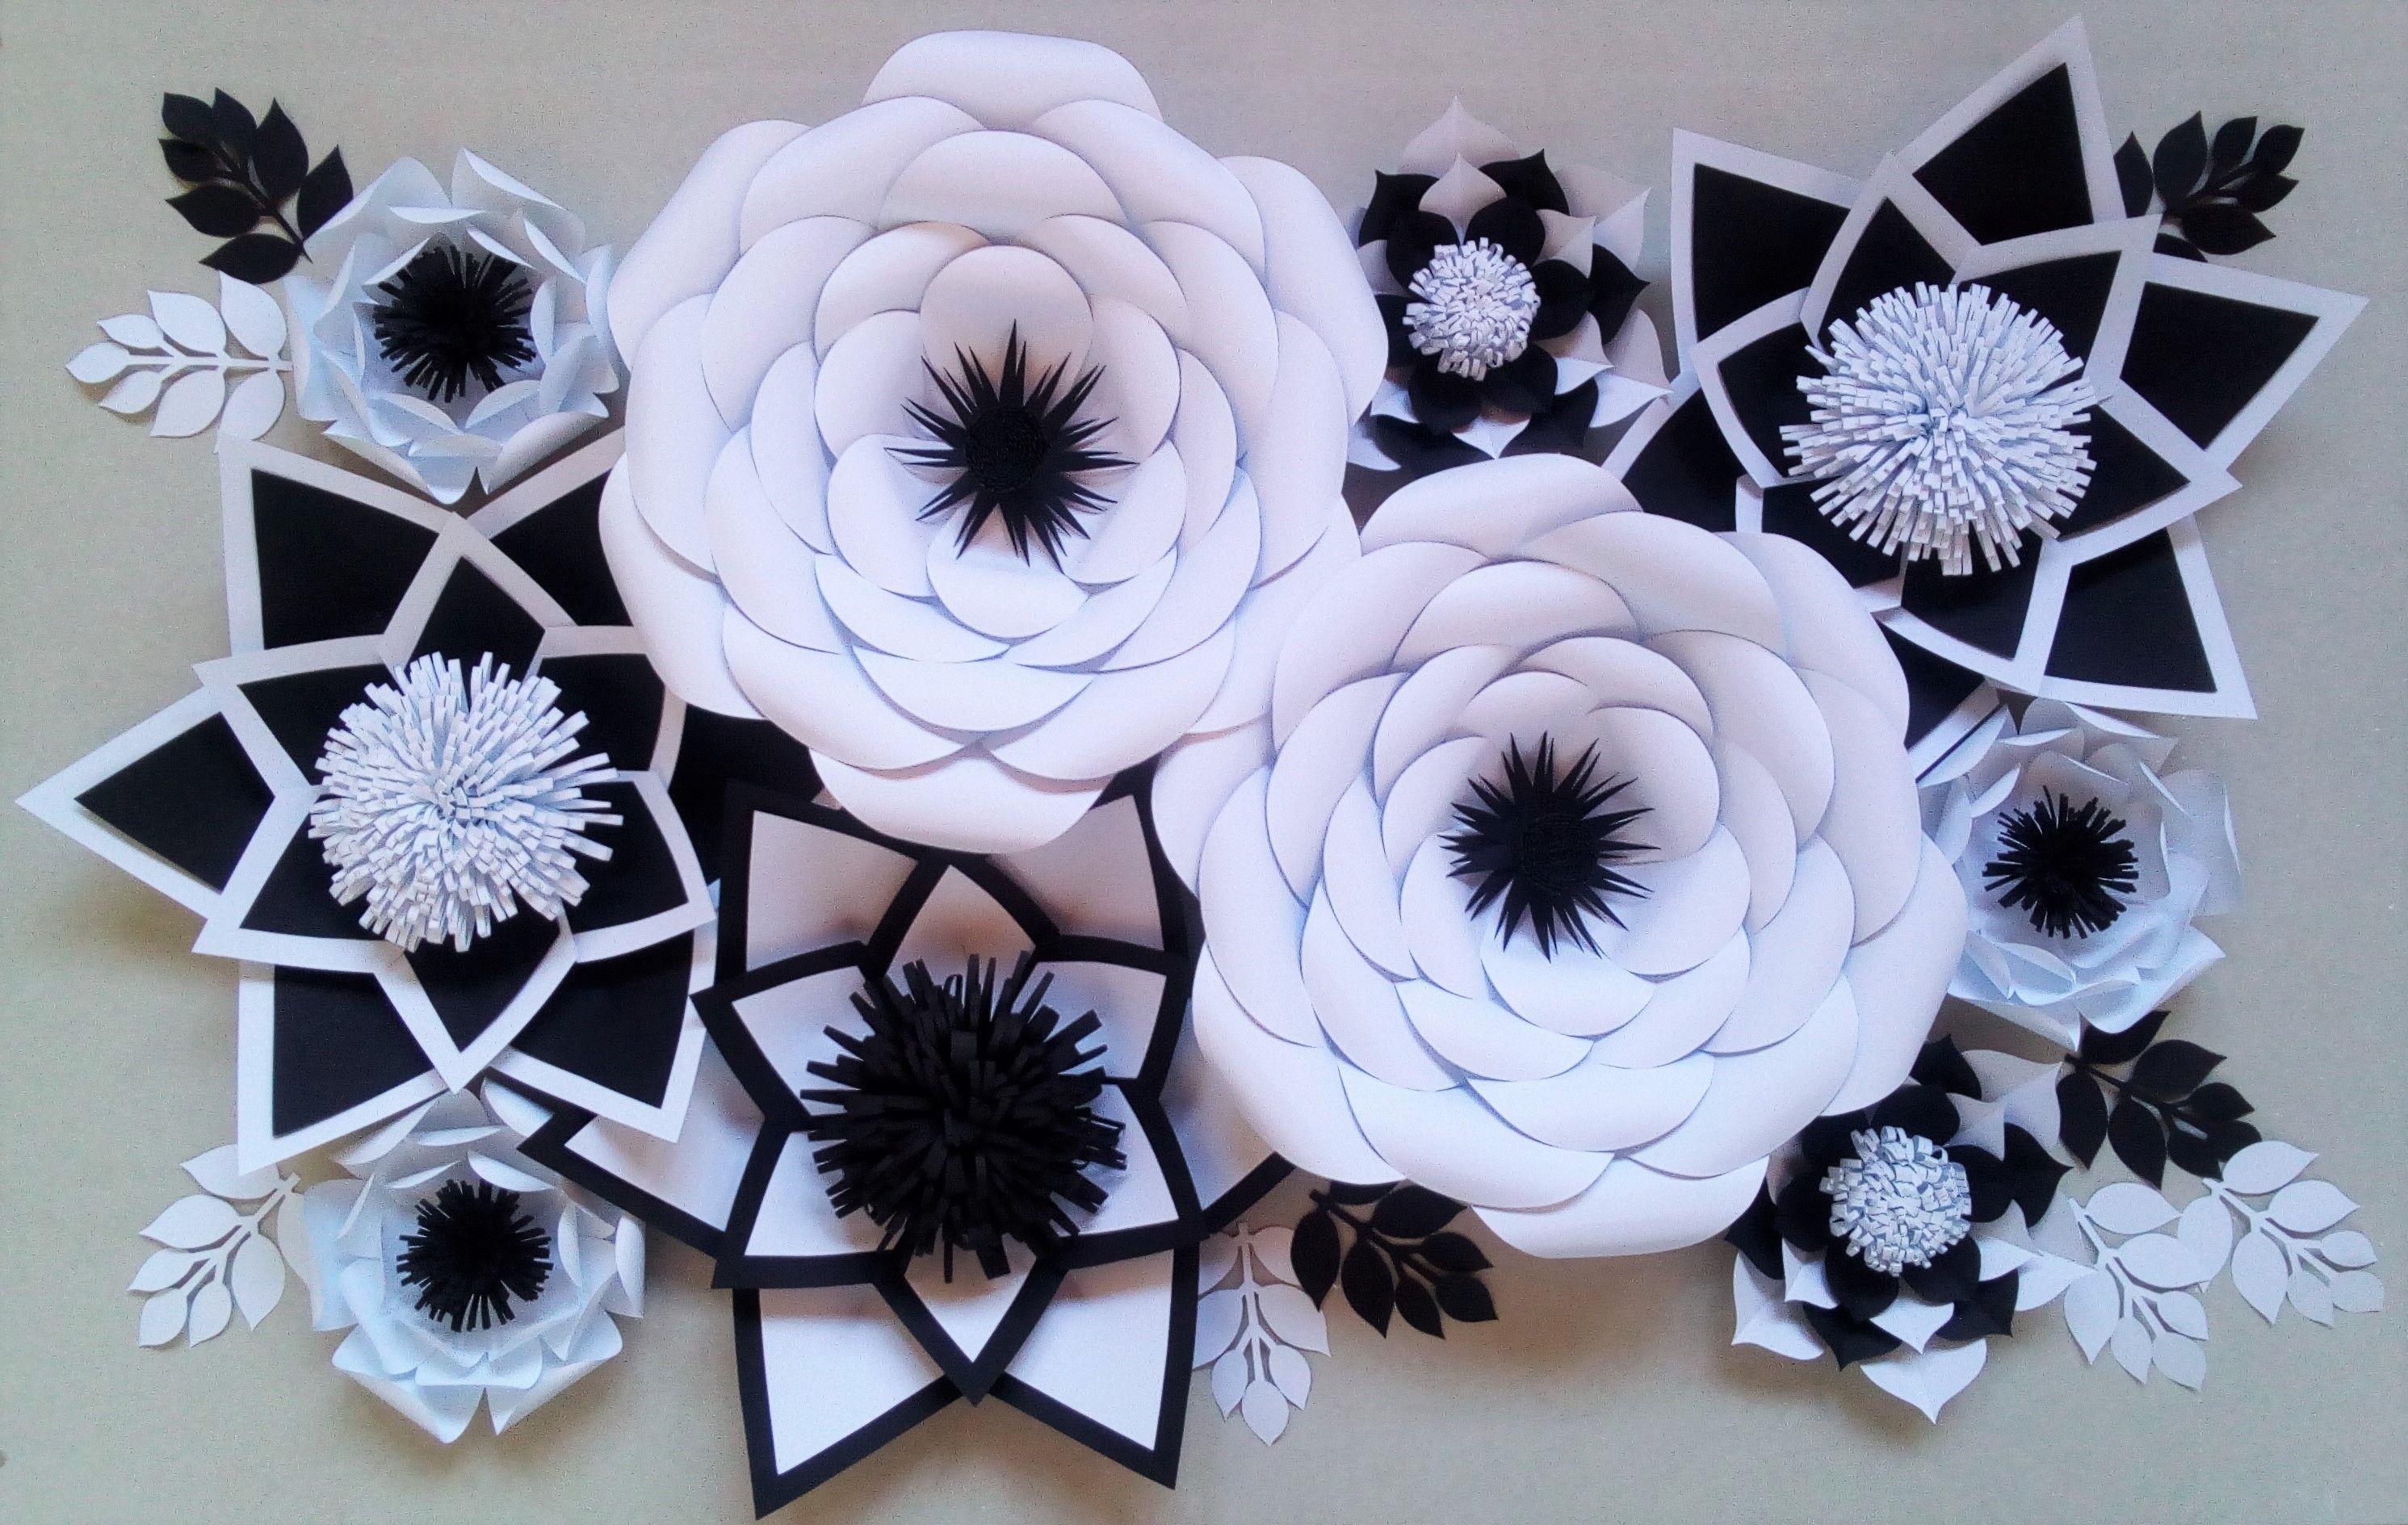 Kwiaty Z Papieru Paper Flowers Kwiaty Chanel Paper Flowers Flower Backdrop White Flowers